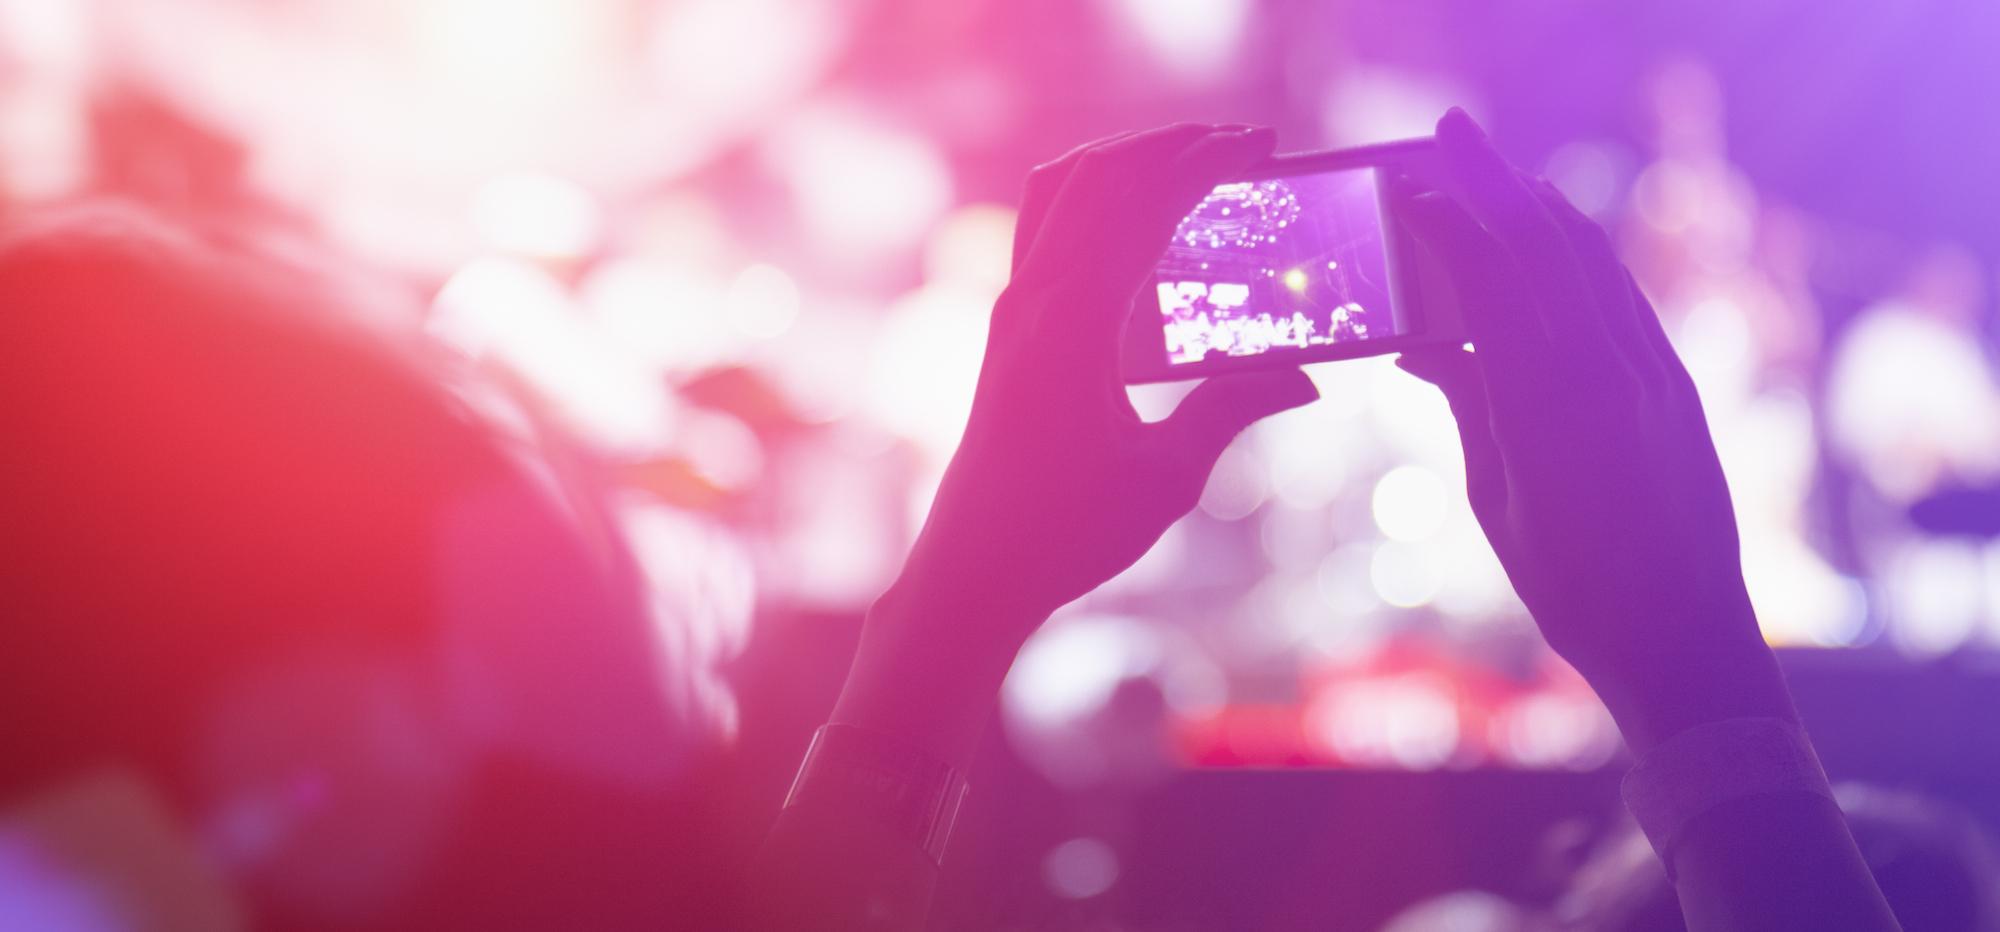 10 Image Editing Tools To Make Photos Fit for Social Sharing